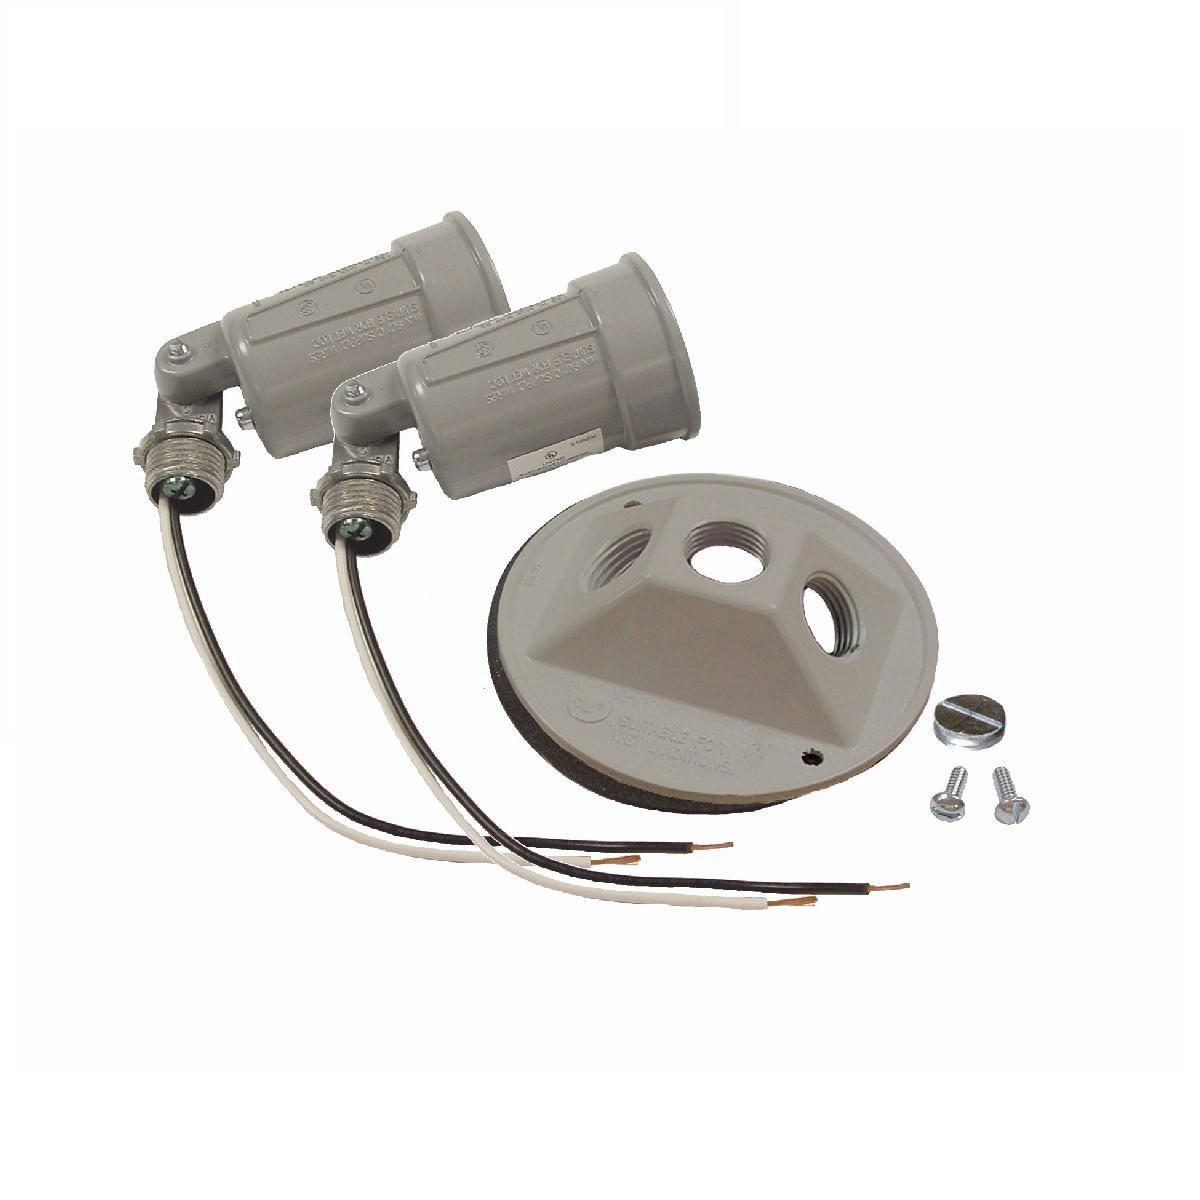 RND WP CLUSTER CVR W/(2) LAMPHOLDER GRAY